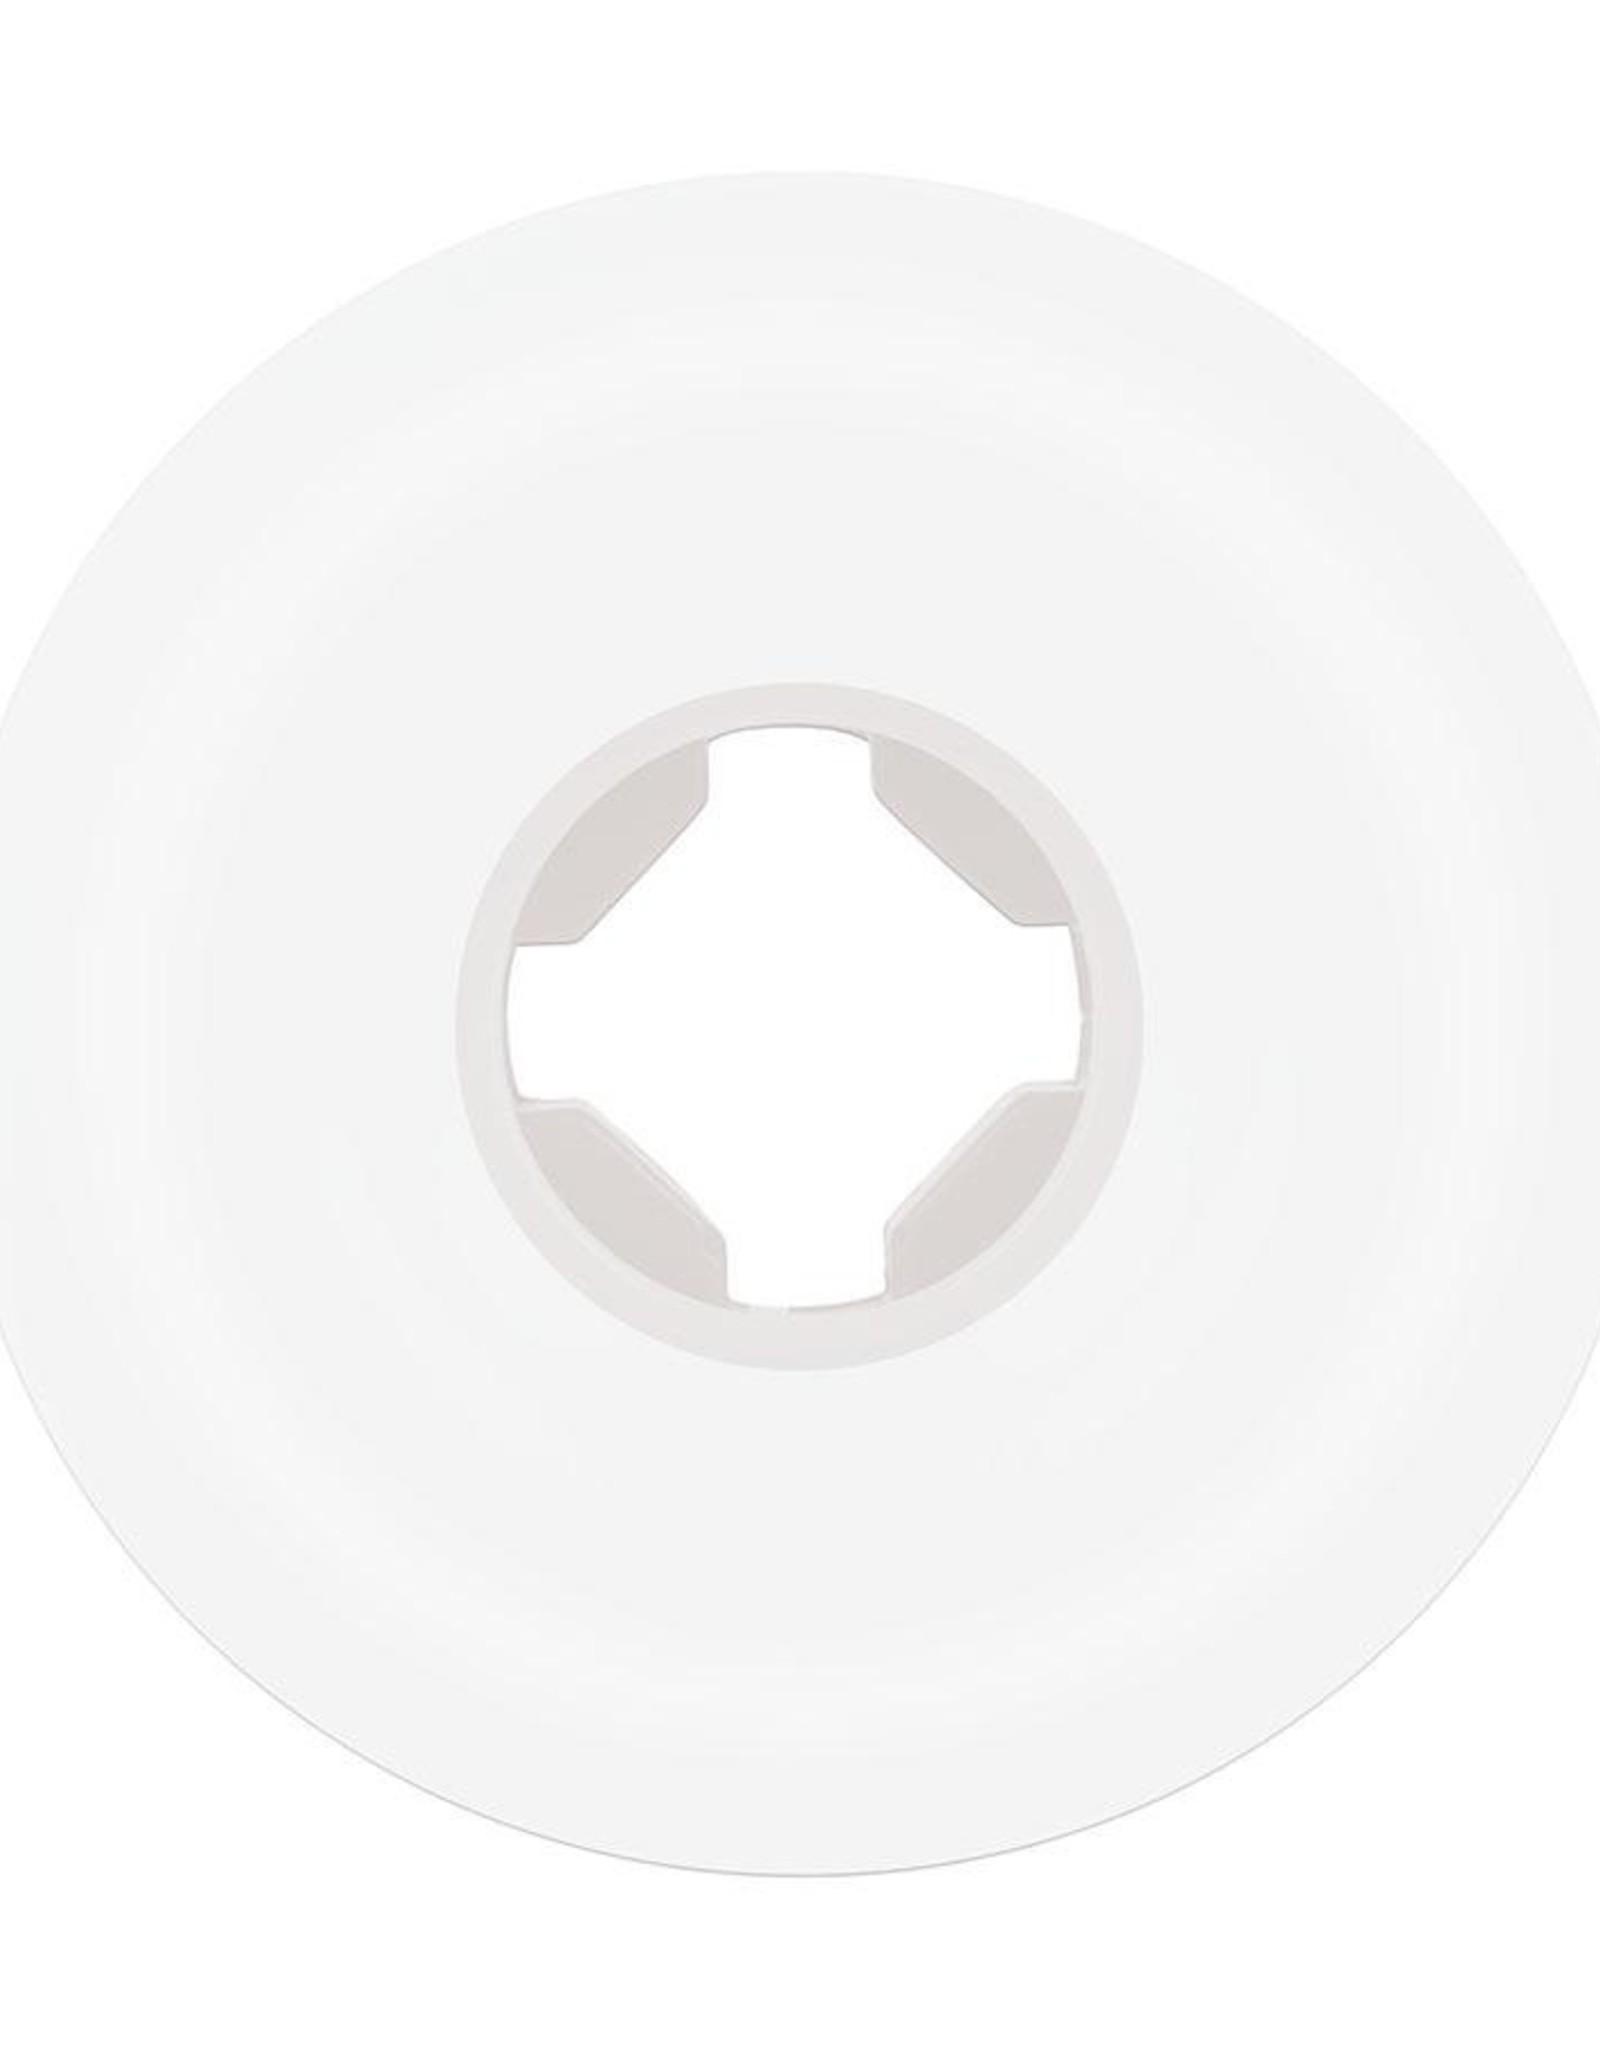 Slimeballs SLIME BALLS WHEELS VOMIT MINI II 97A 53mm